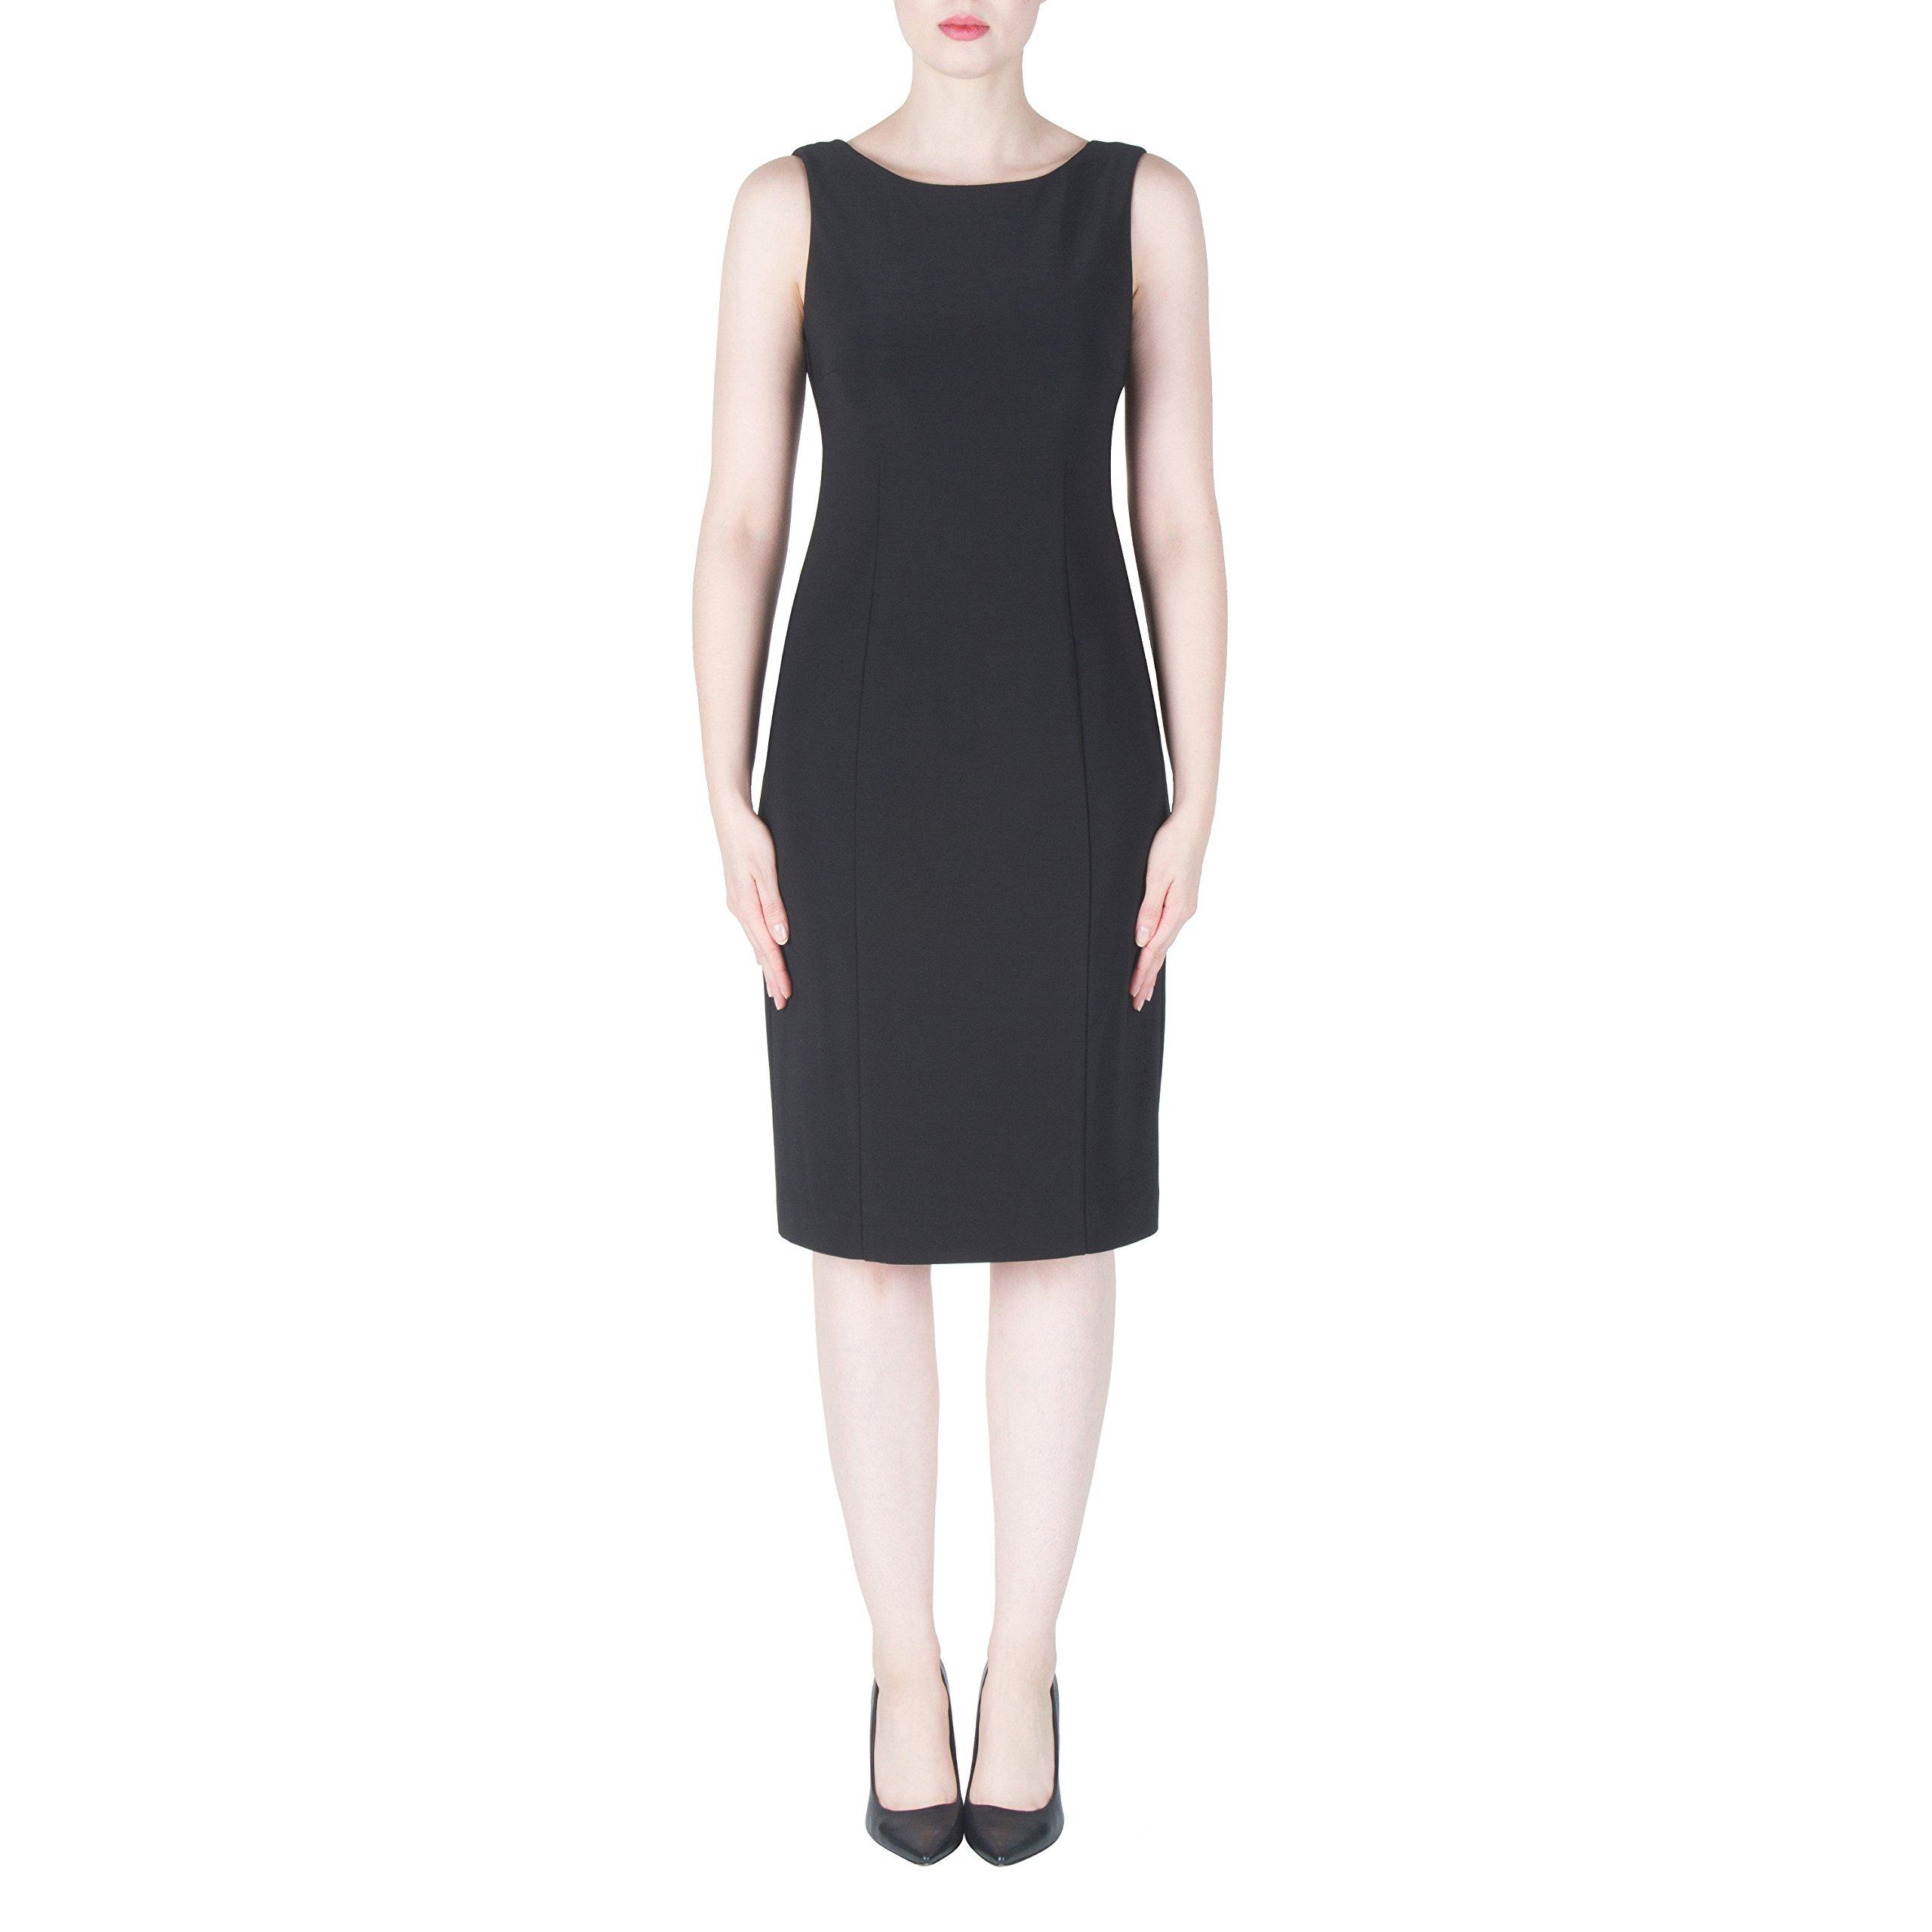 Joseph Ribkoff Black Open Back with Jewel Chain Accent Dress Style 171009 - Size 16 by Joseph Ribkoff